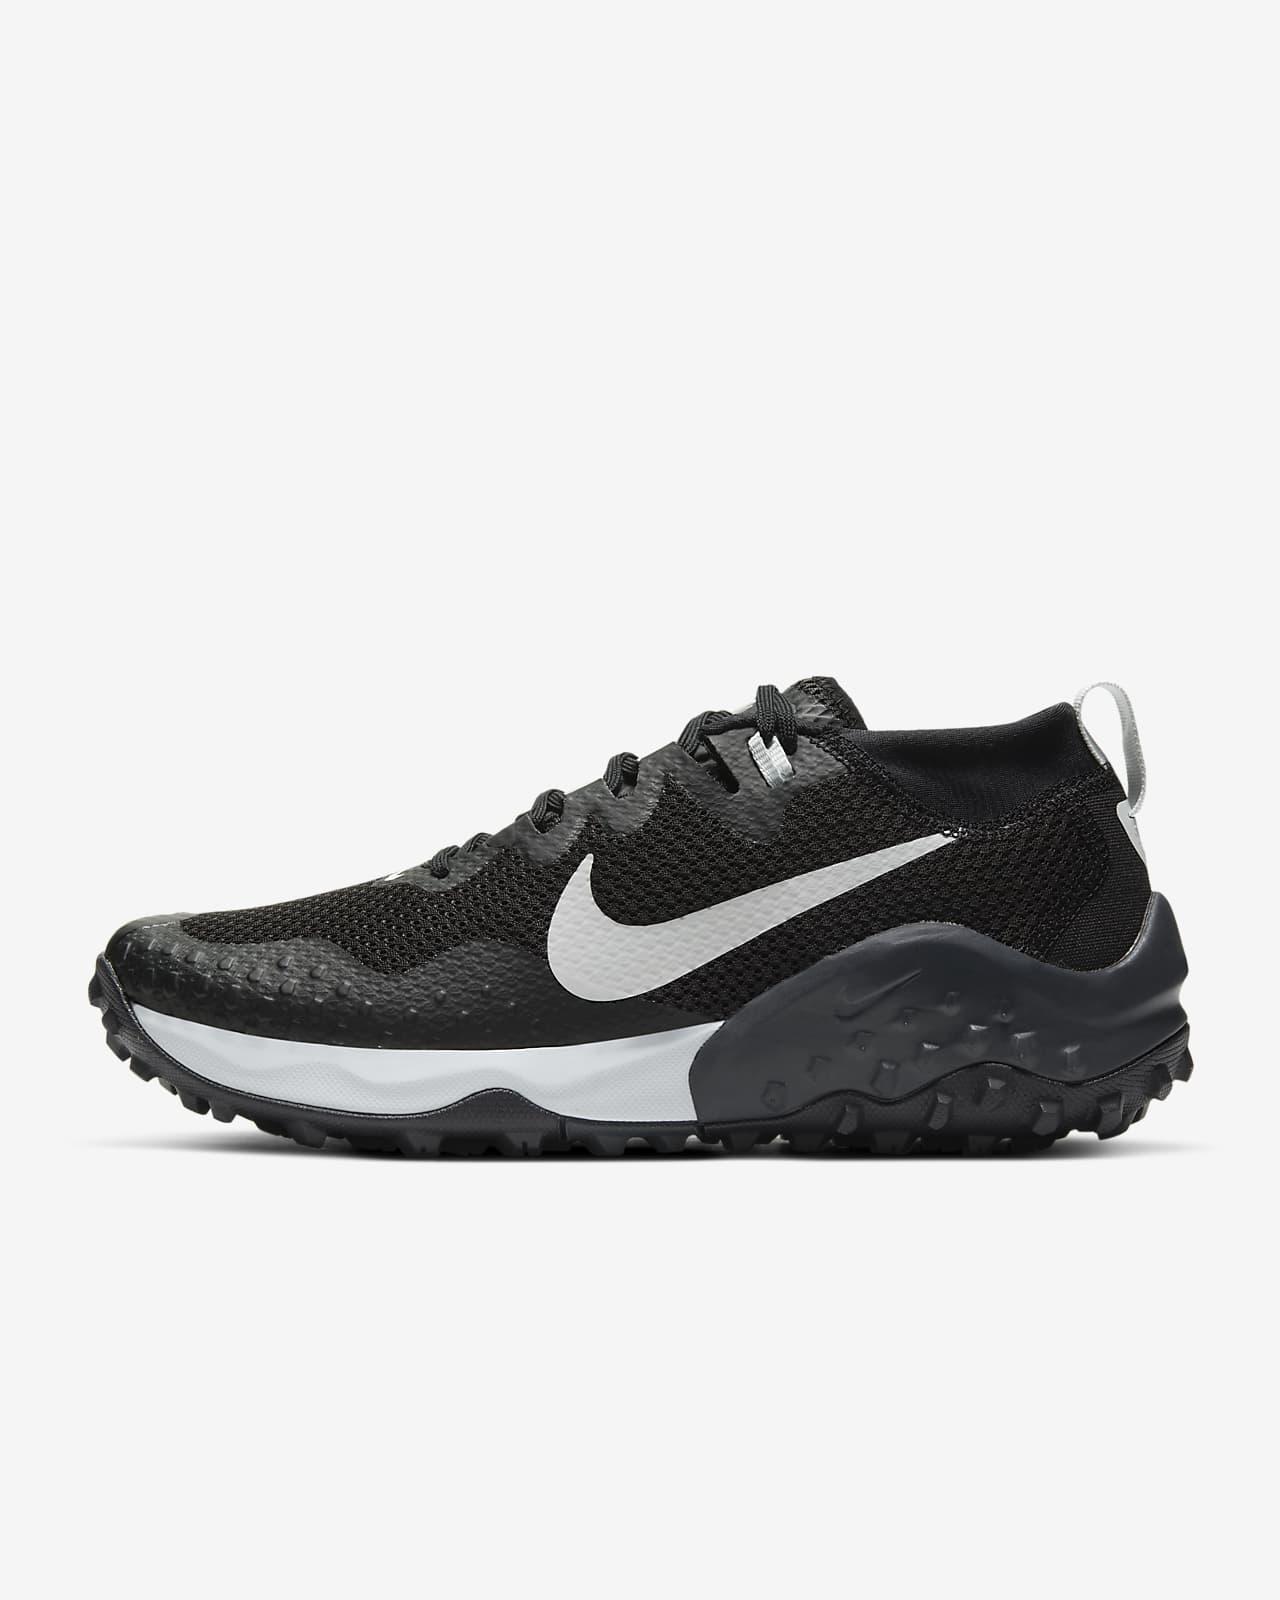 Chaussure de running sur sentier Nike Wildhorse 7 pour Femme